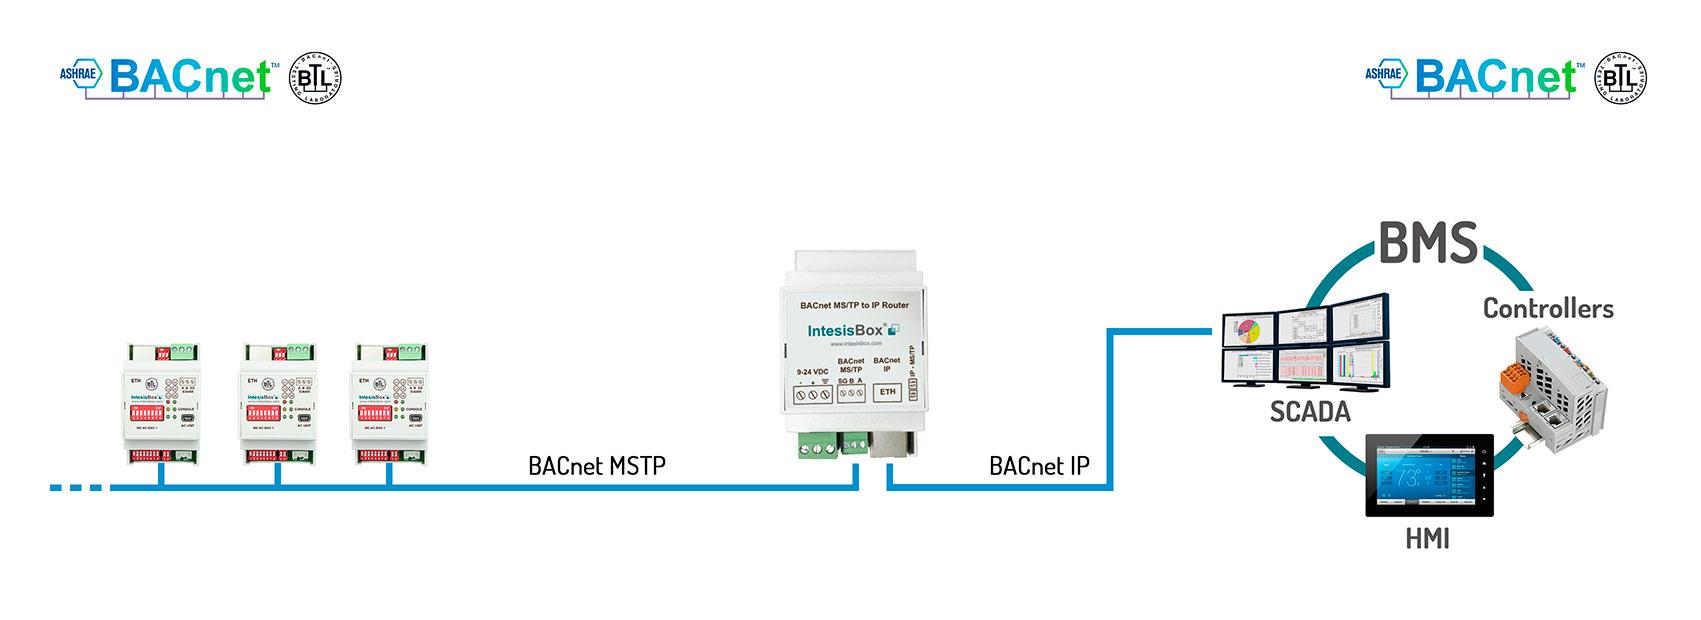 ibox-bac-router.jpg